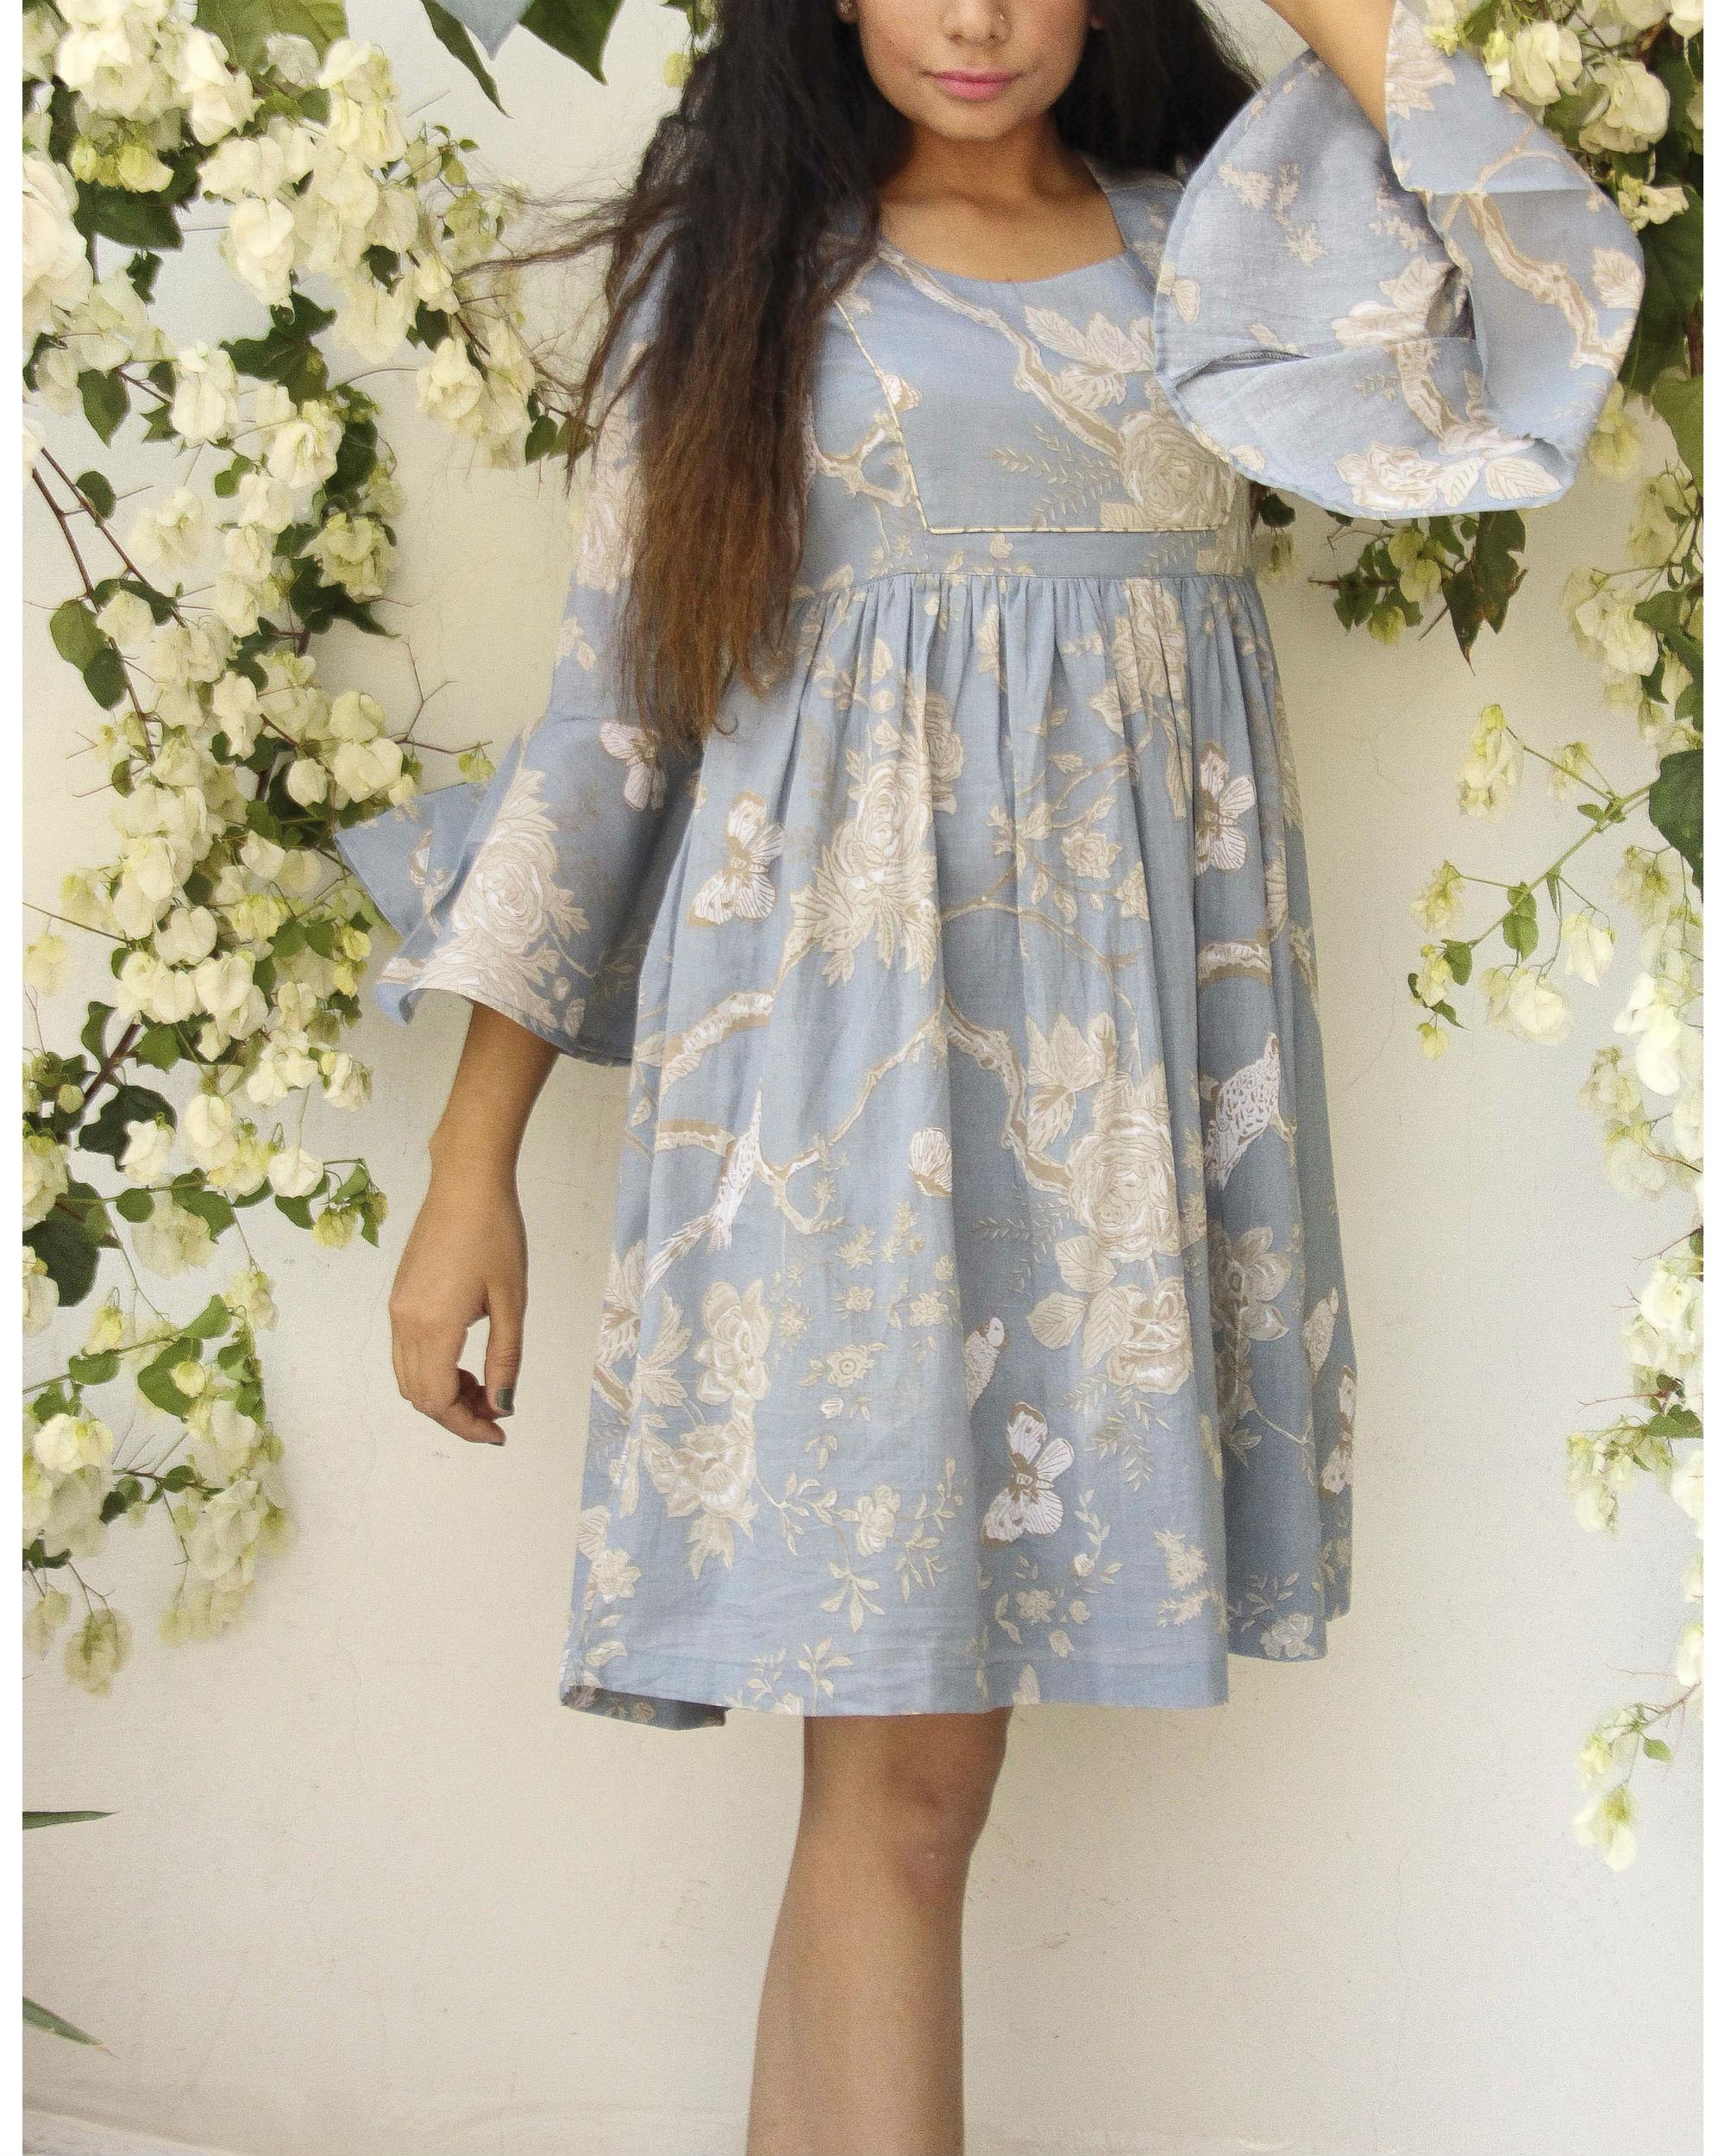 Floret dress